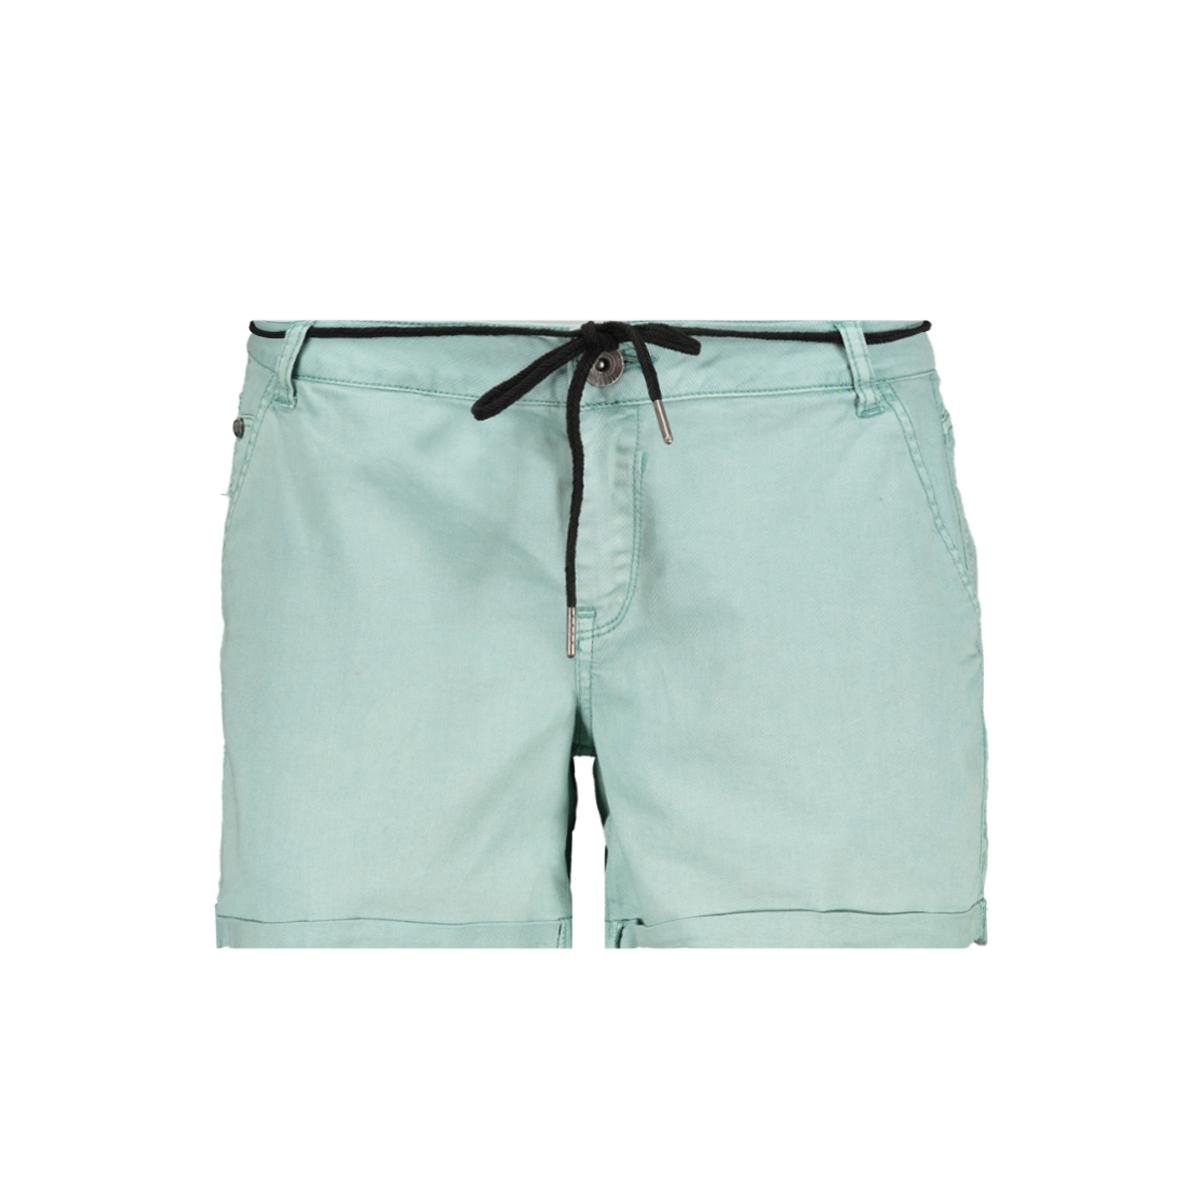 mintgroene short met taillekoord gs900112 garcia korte broek 2715 perfect mint